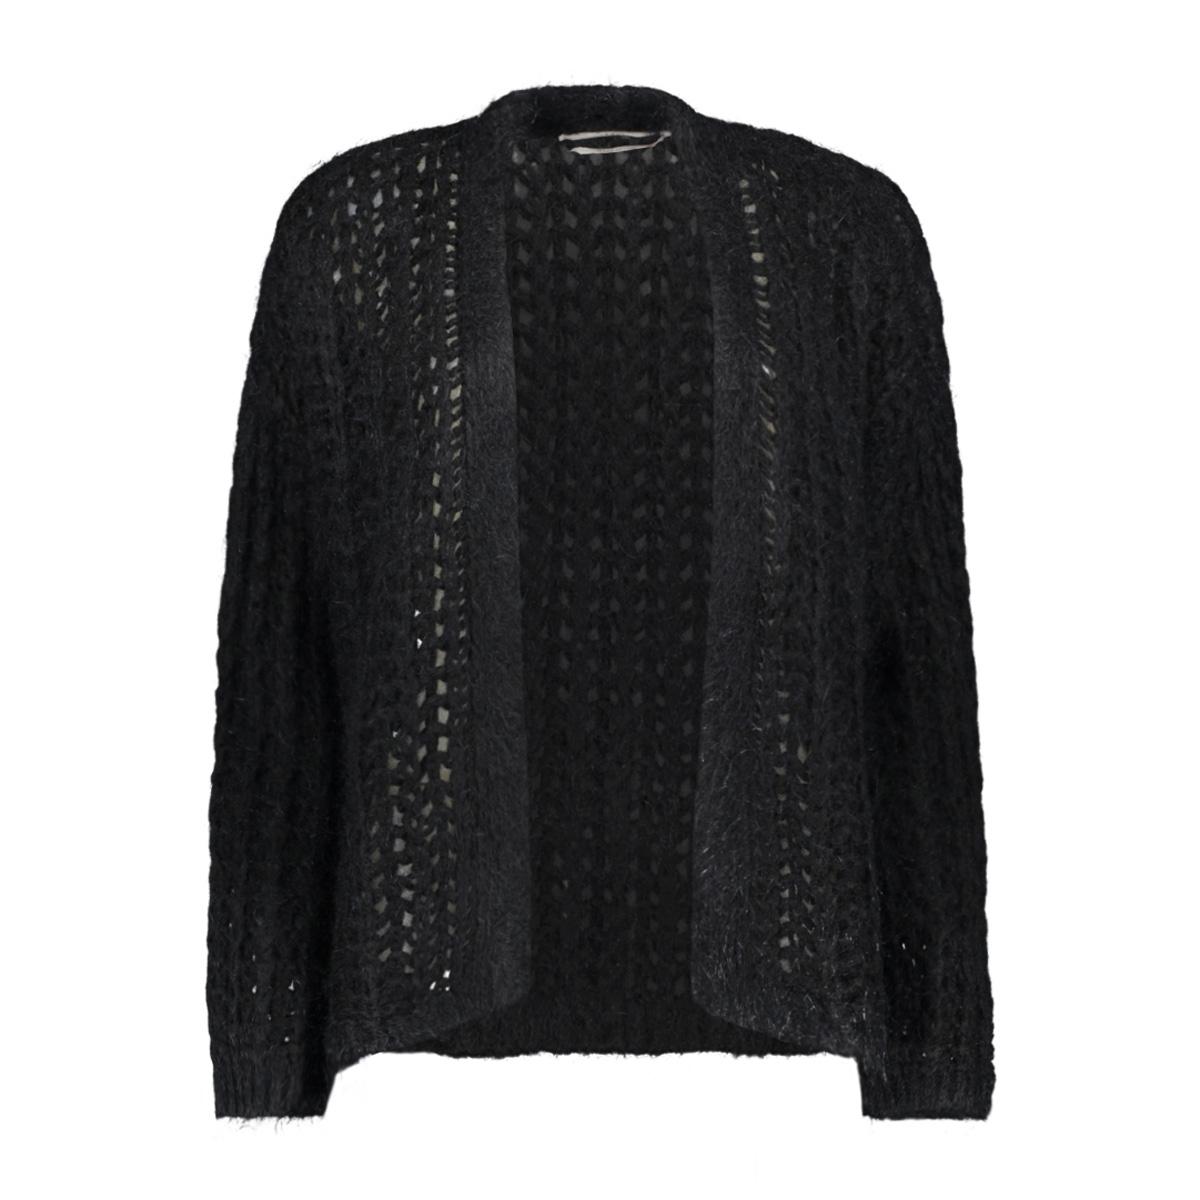 dylene rib cardigan 300 aaiko vest black